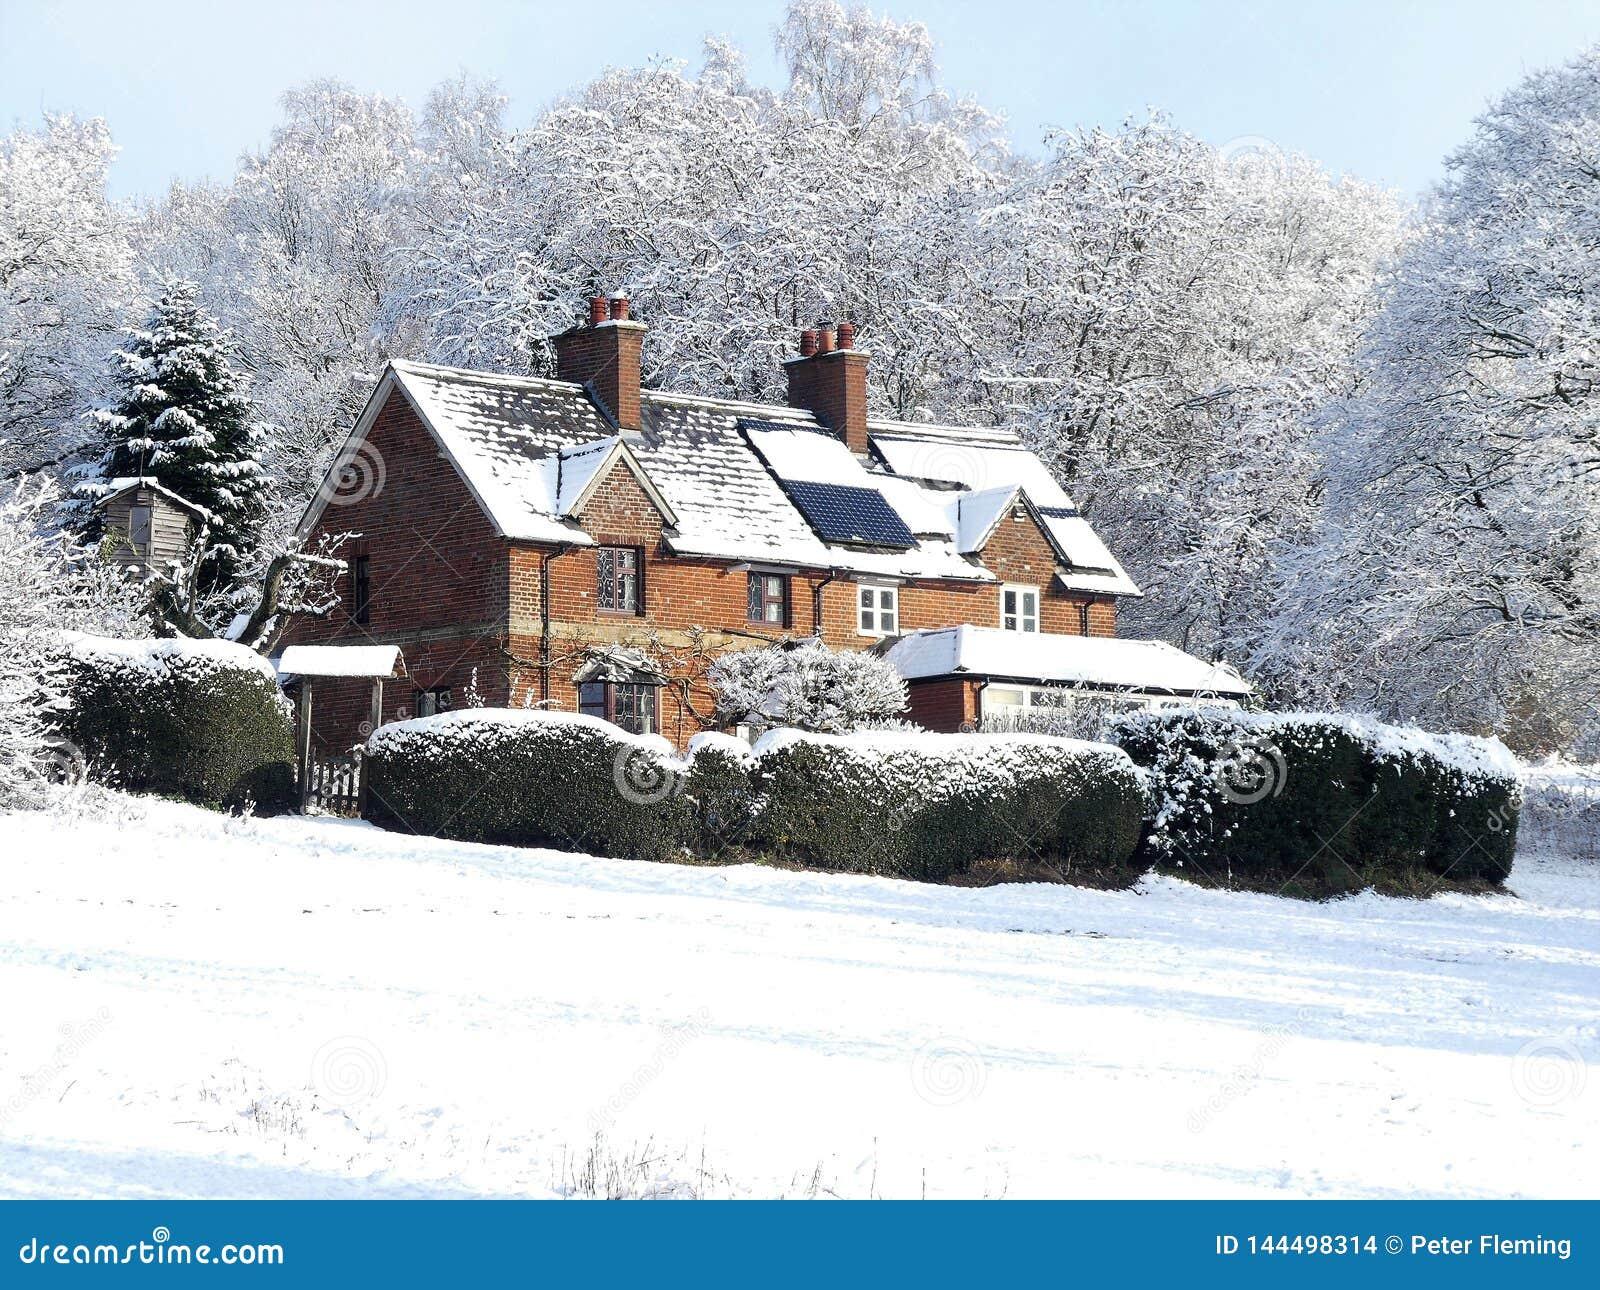 Cherry Tree Dell, Chorleywood Common, Chorleywood in winter snow